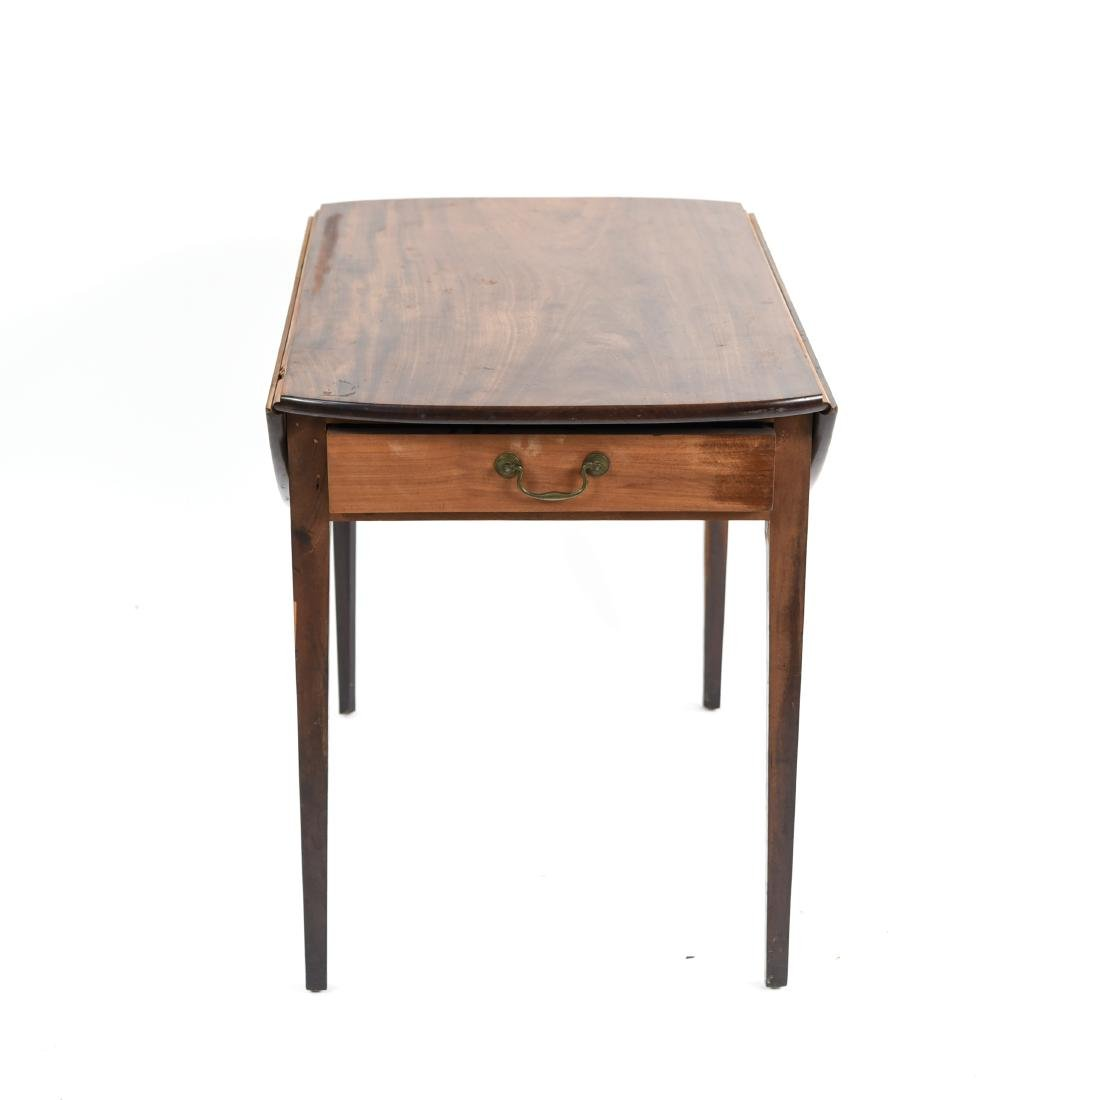 DROP LEAF PEMBROKE TABLE